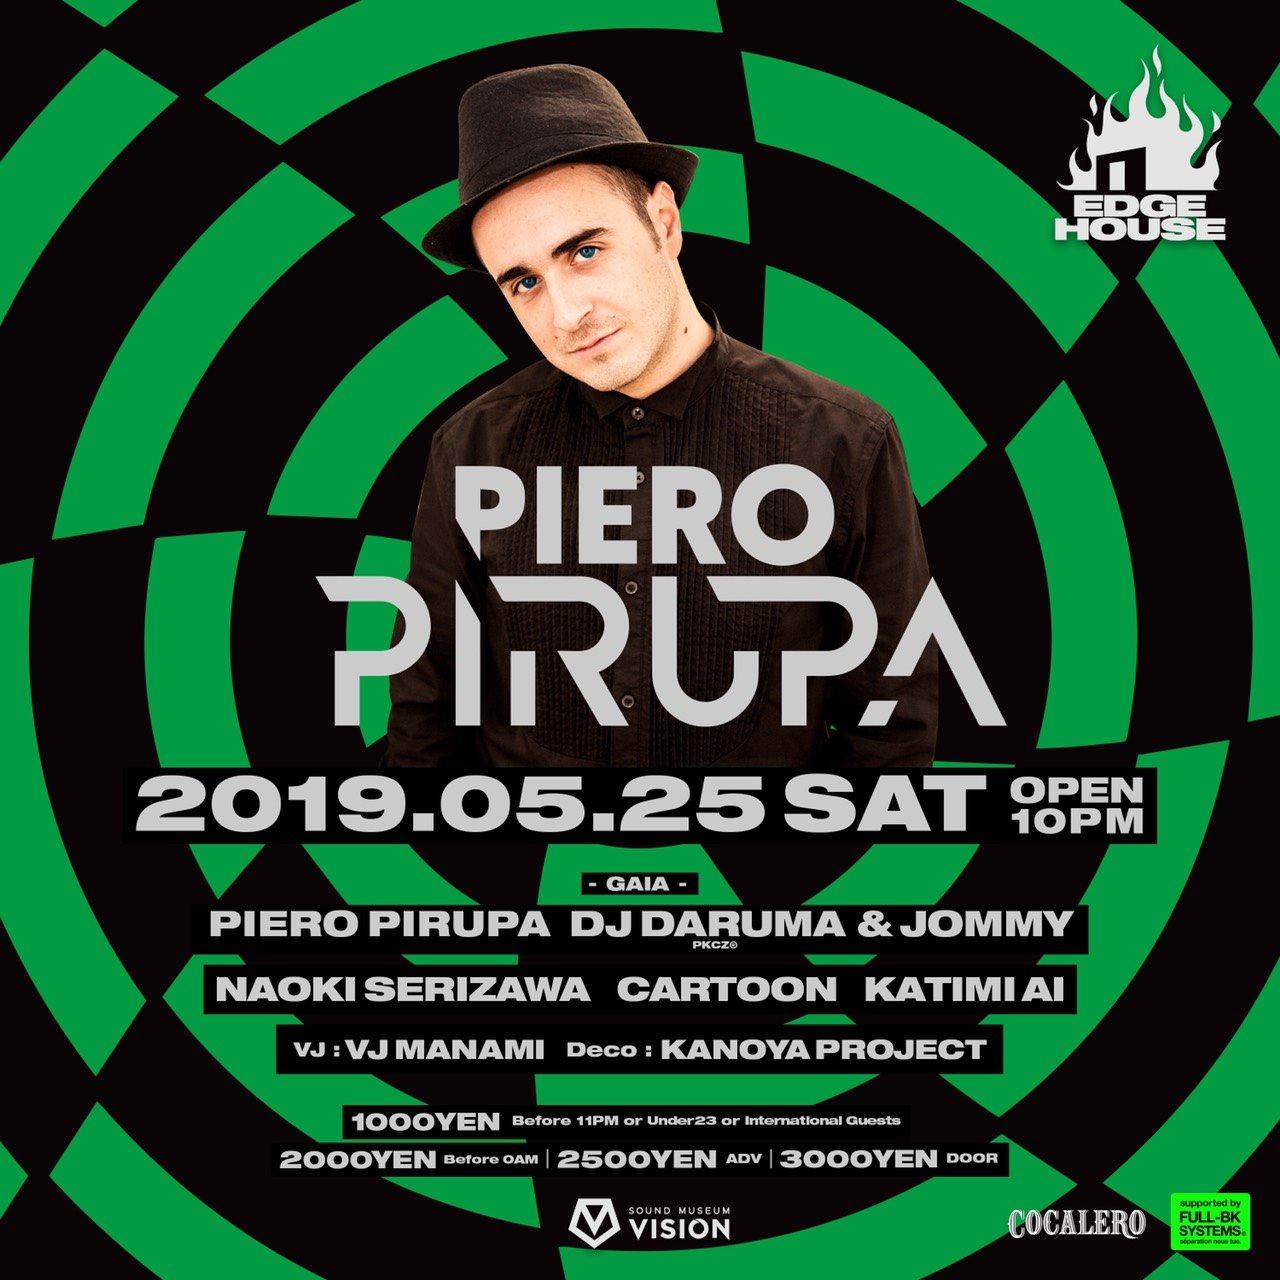 Edge House Feat. Piero Pirupa - Flyer front